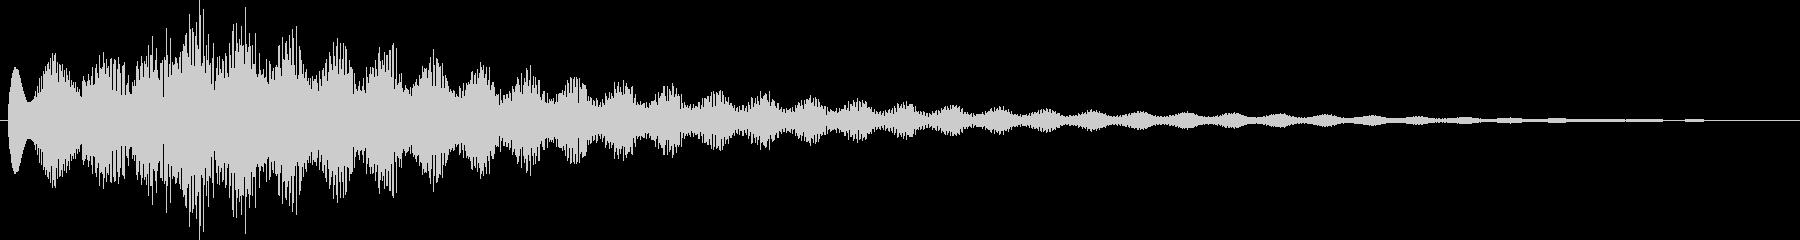 Vibraphone:Time T...の未再生の波形